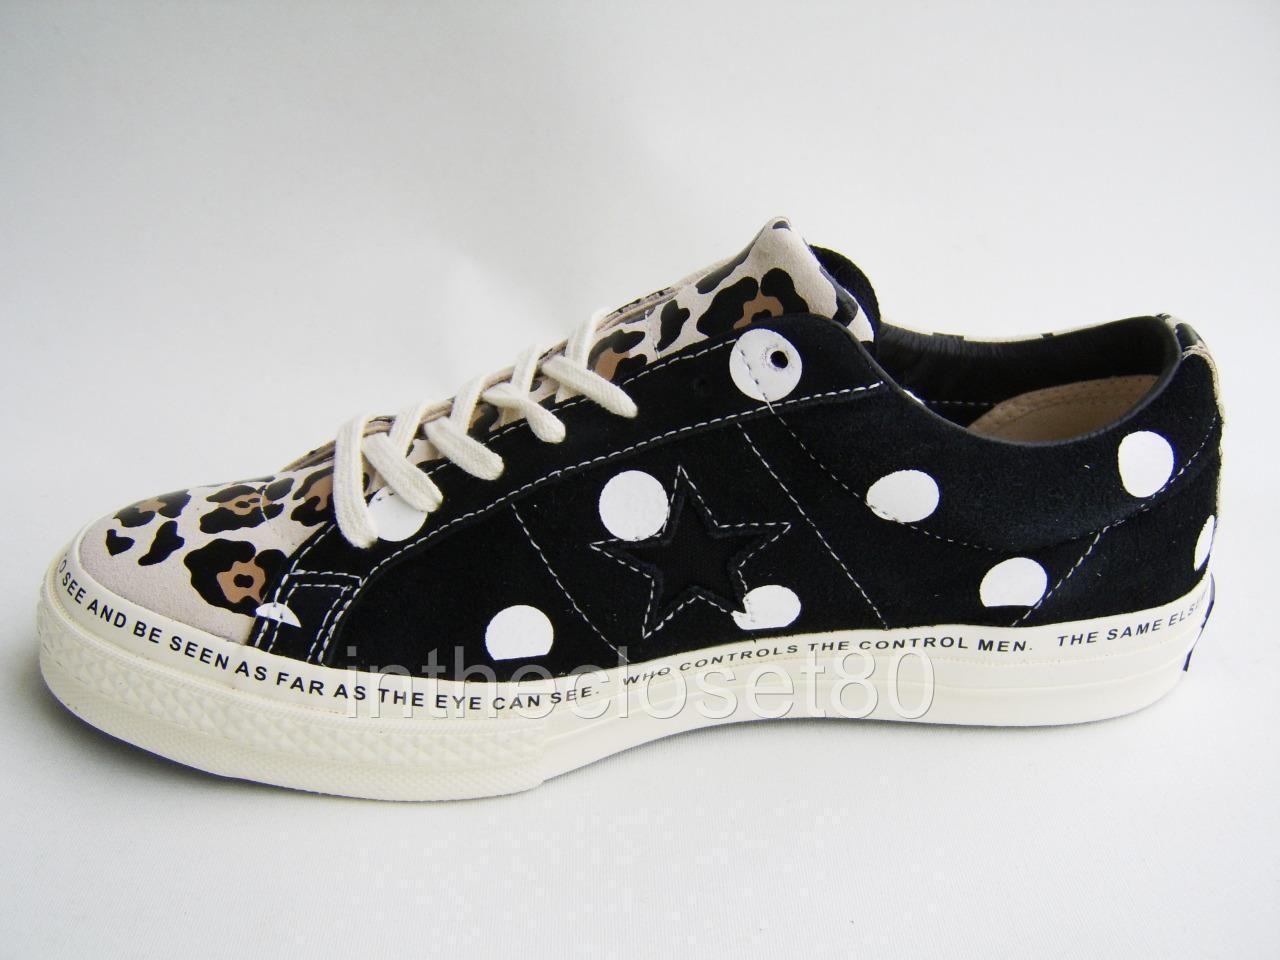 ec110dc42eb0 Converse One Star x Brain Dead Zebra Leopard Polka Suede Black Off White